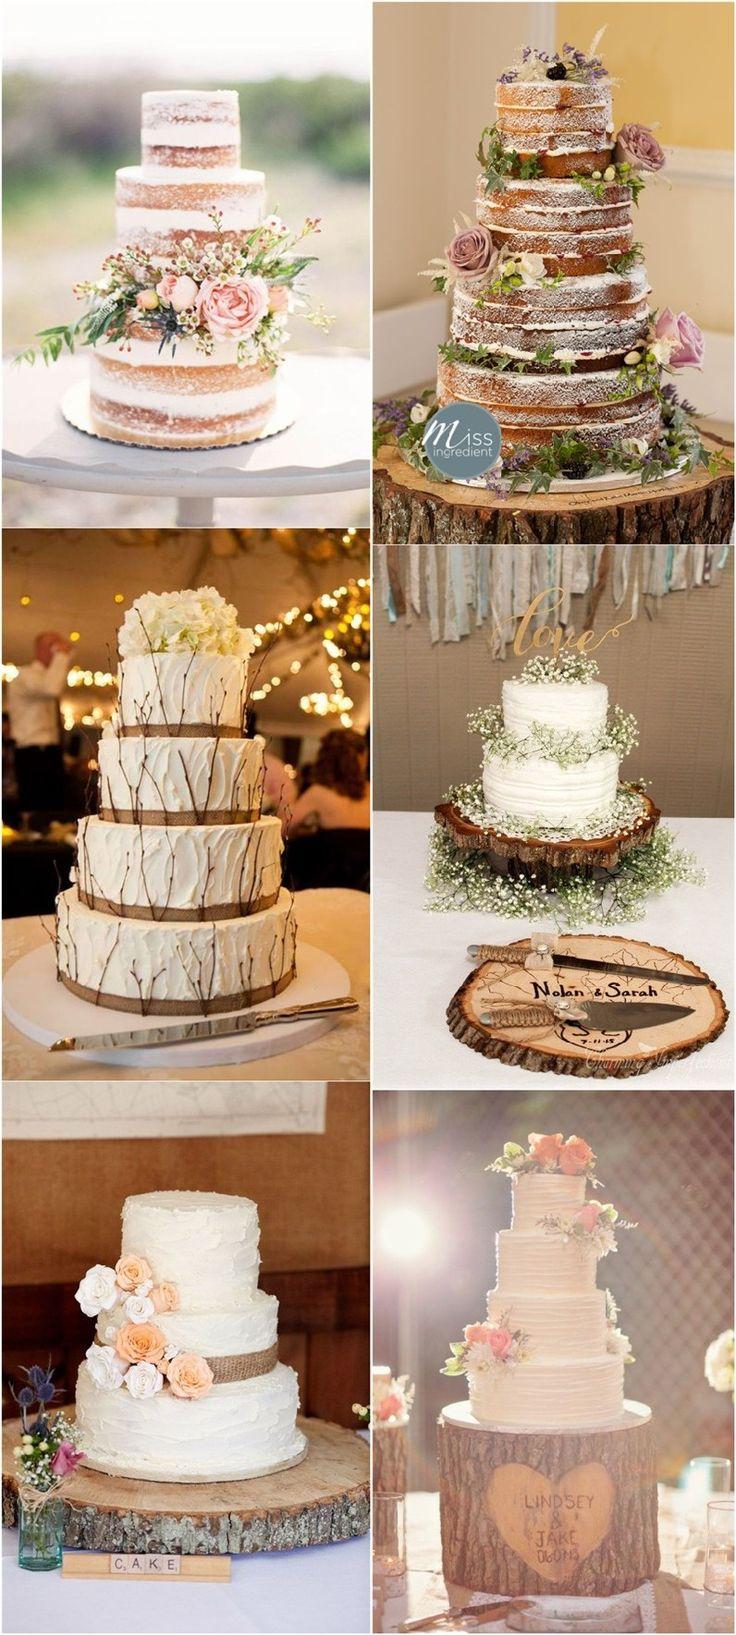 Uncategorized/outdoor vintage glam wedding rustic wedding chic - 30 Rustic Wedding Theme Ideas